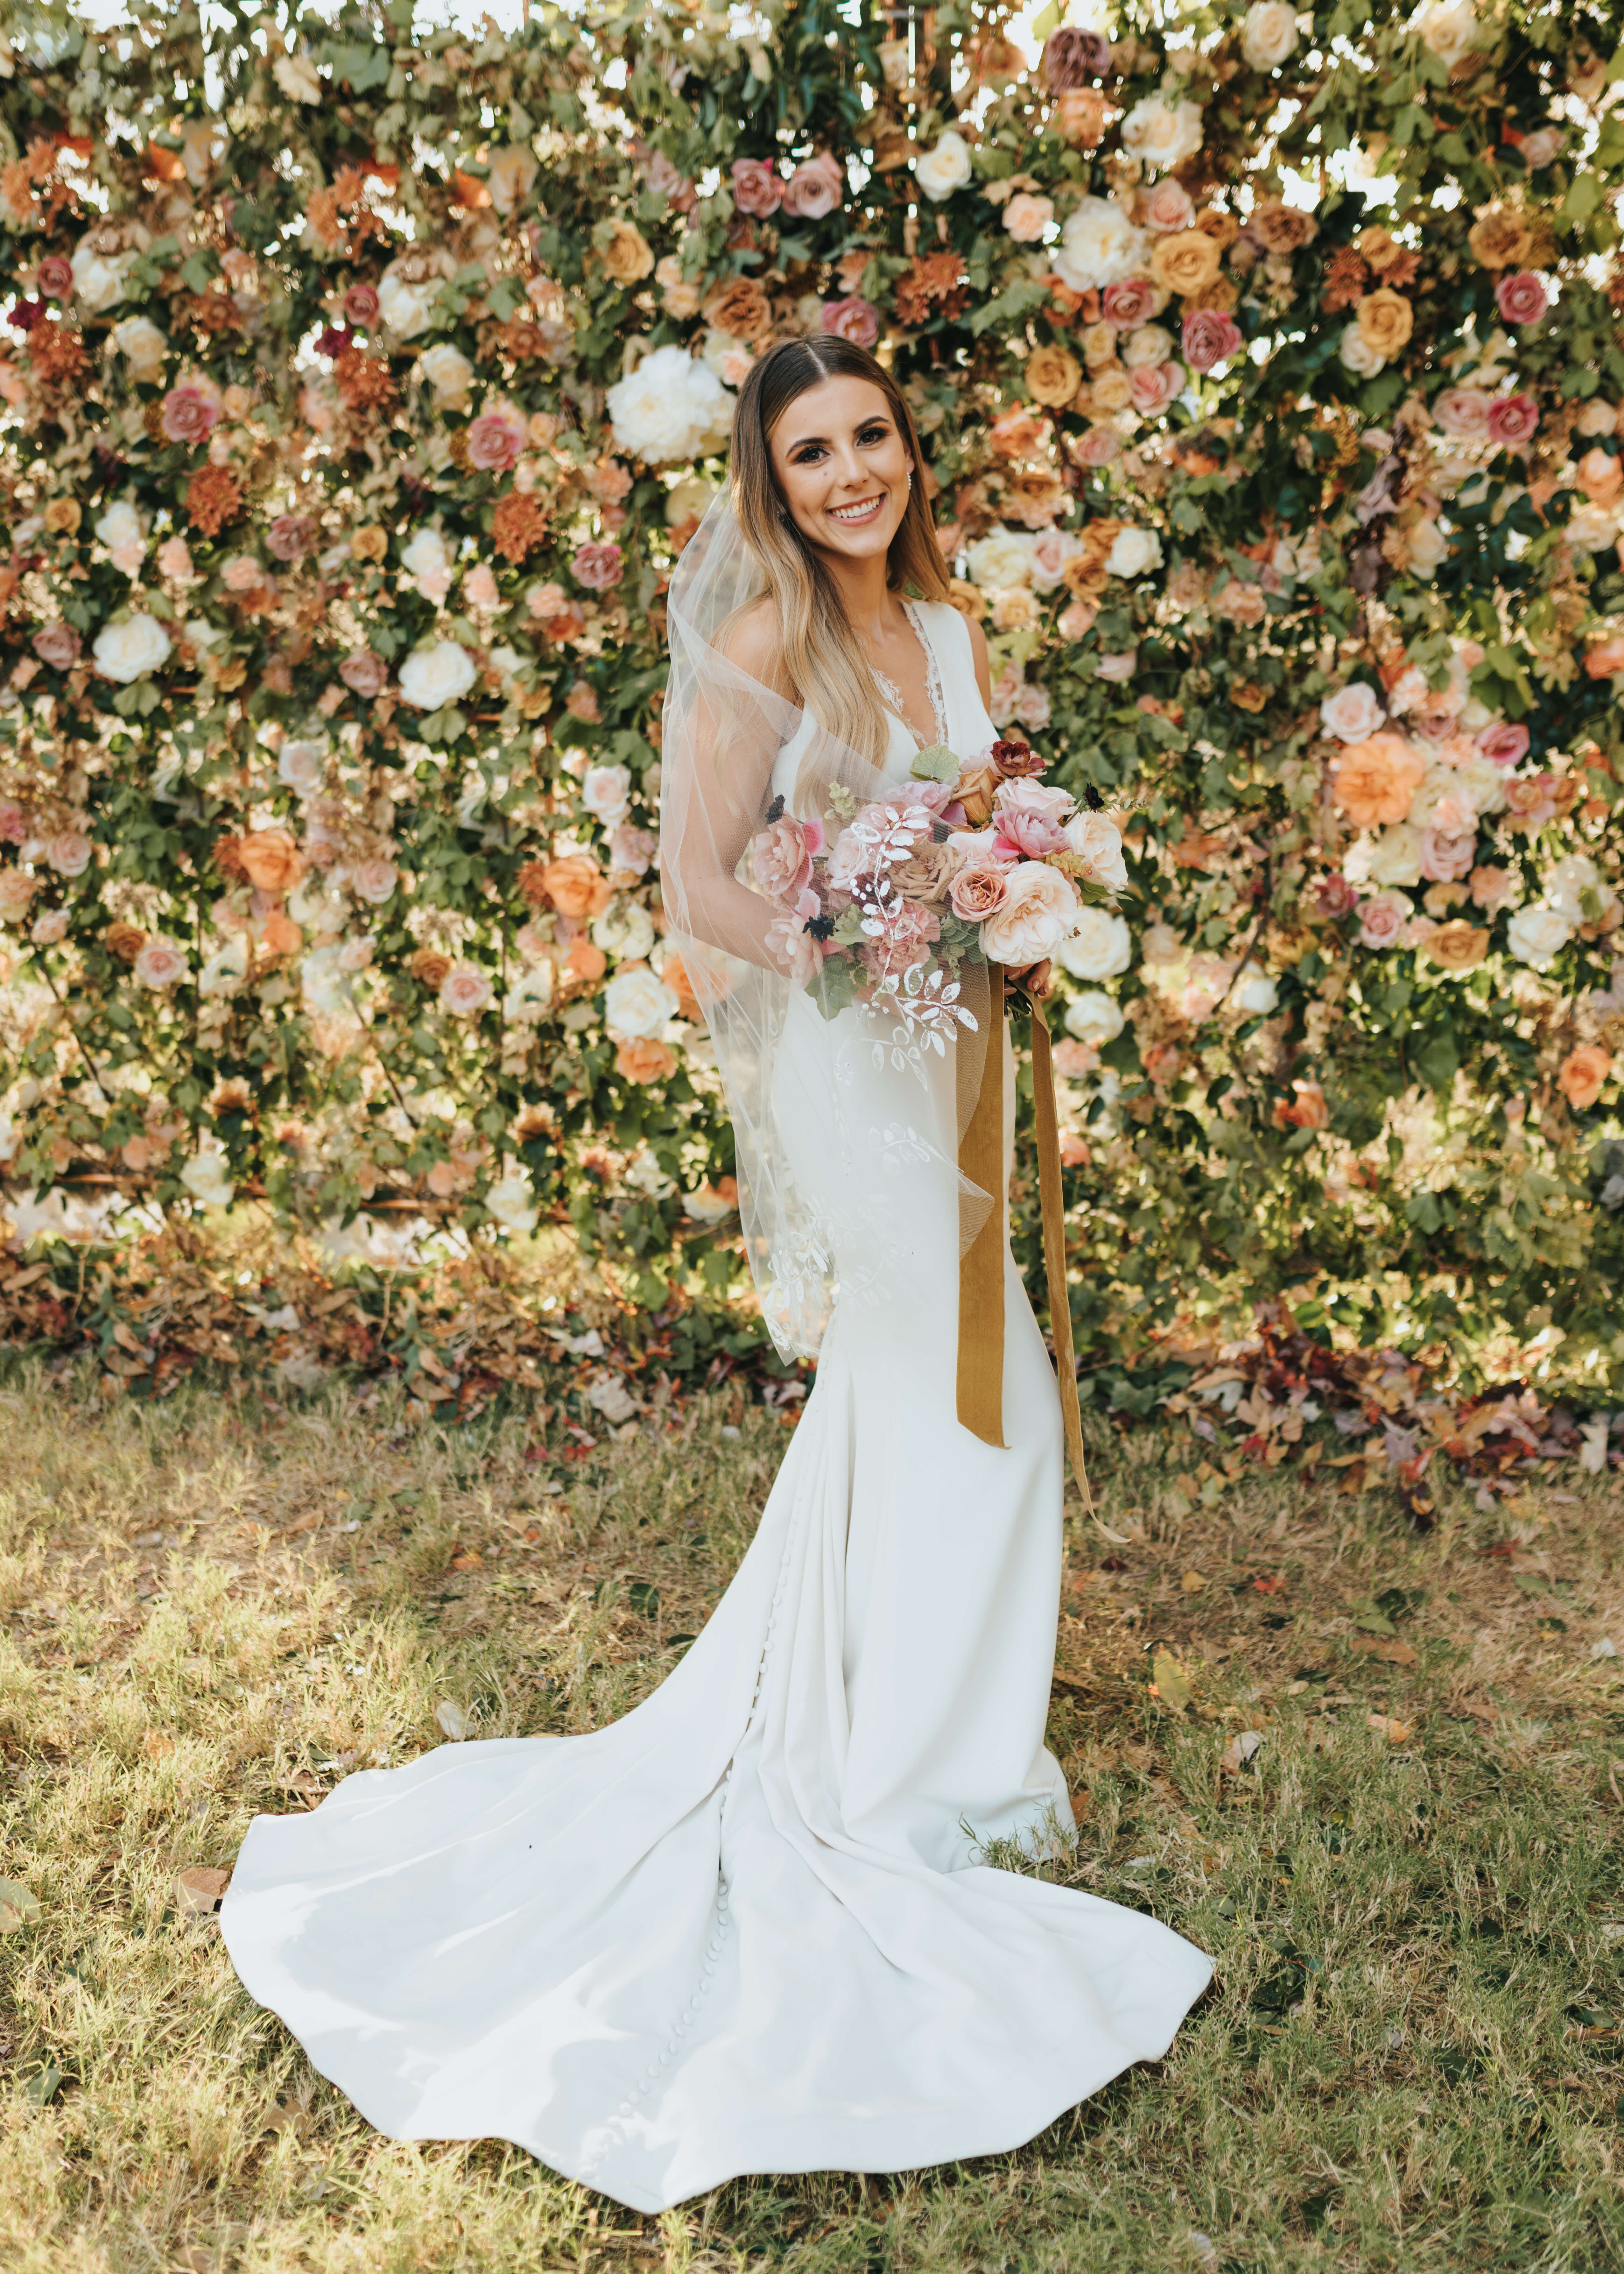 wedding day portrait of bride